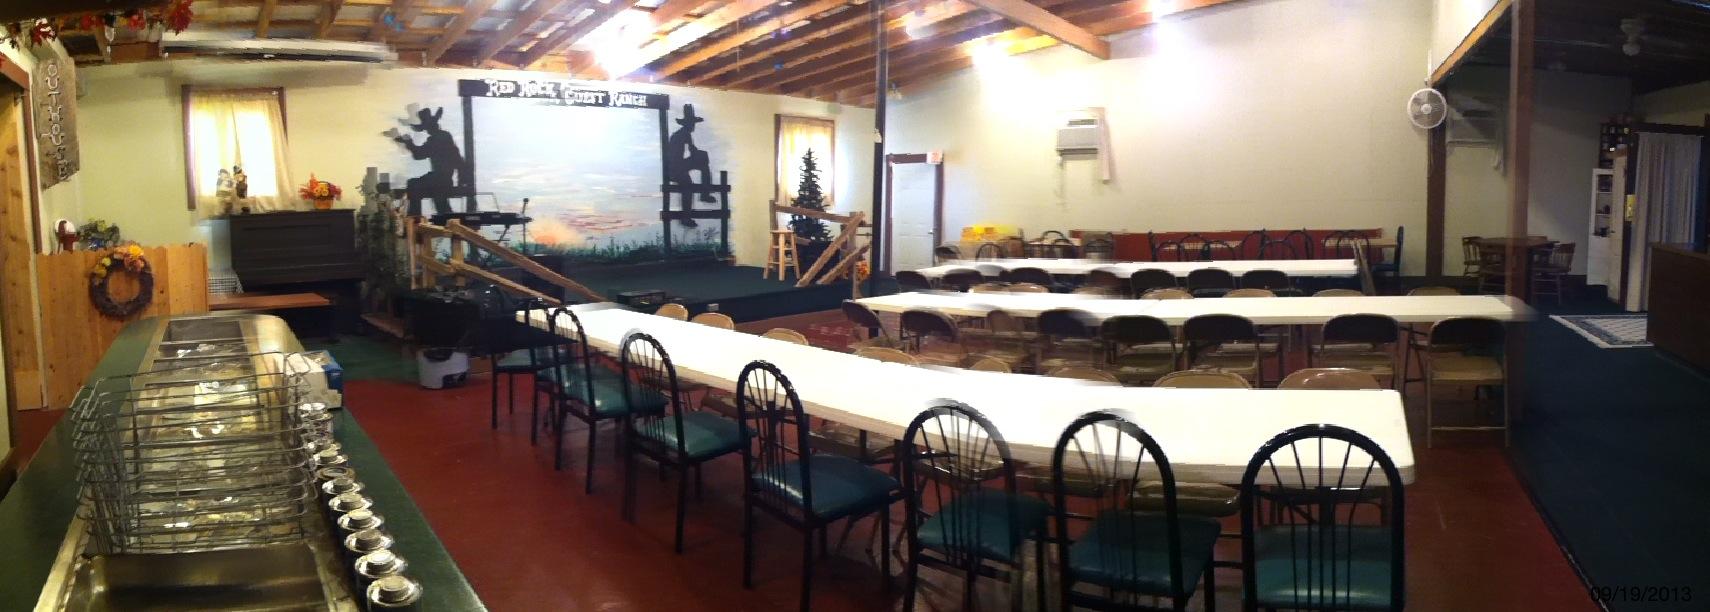 The Dinner Hall